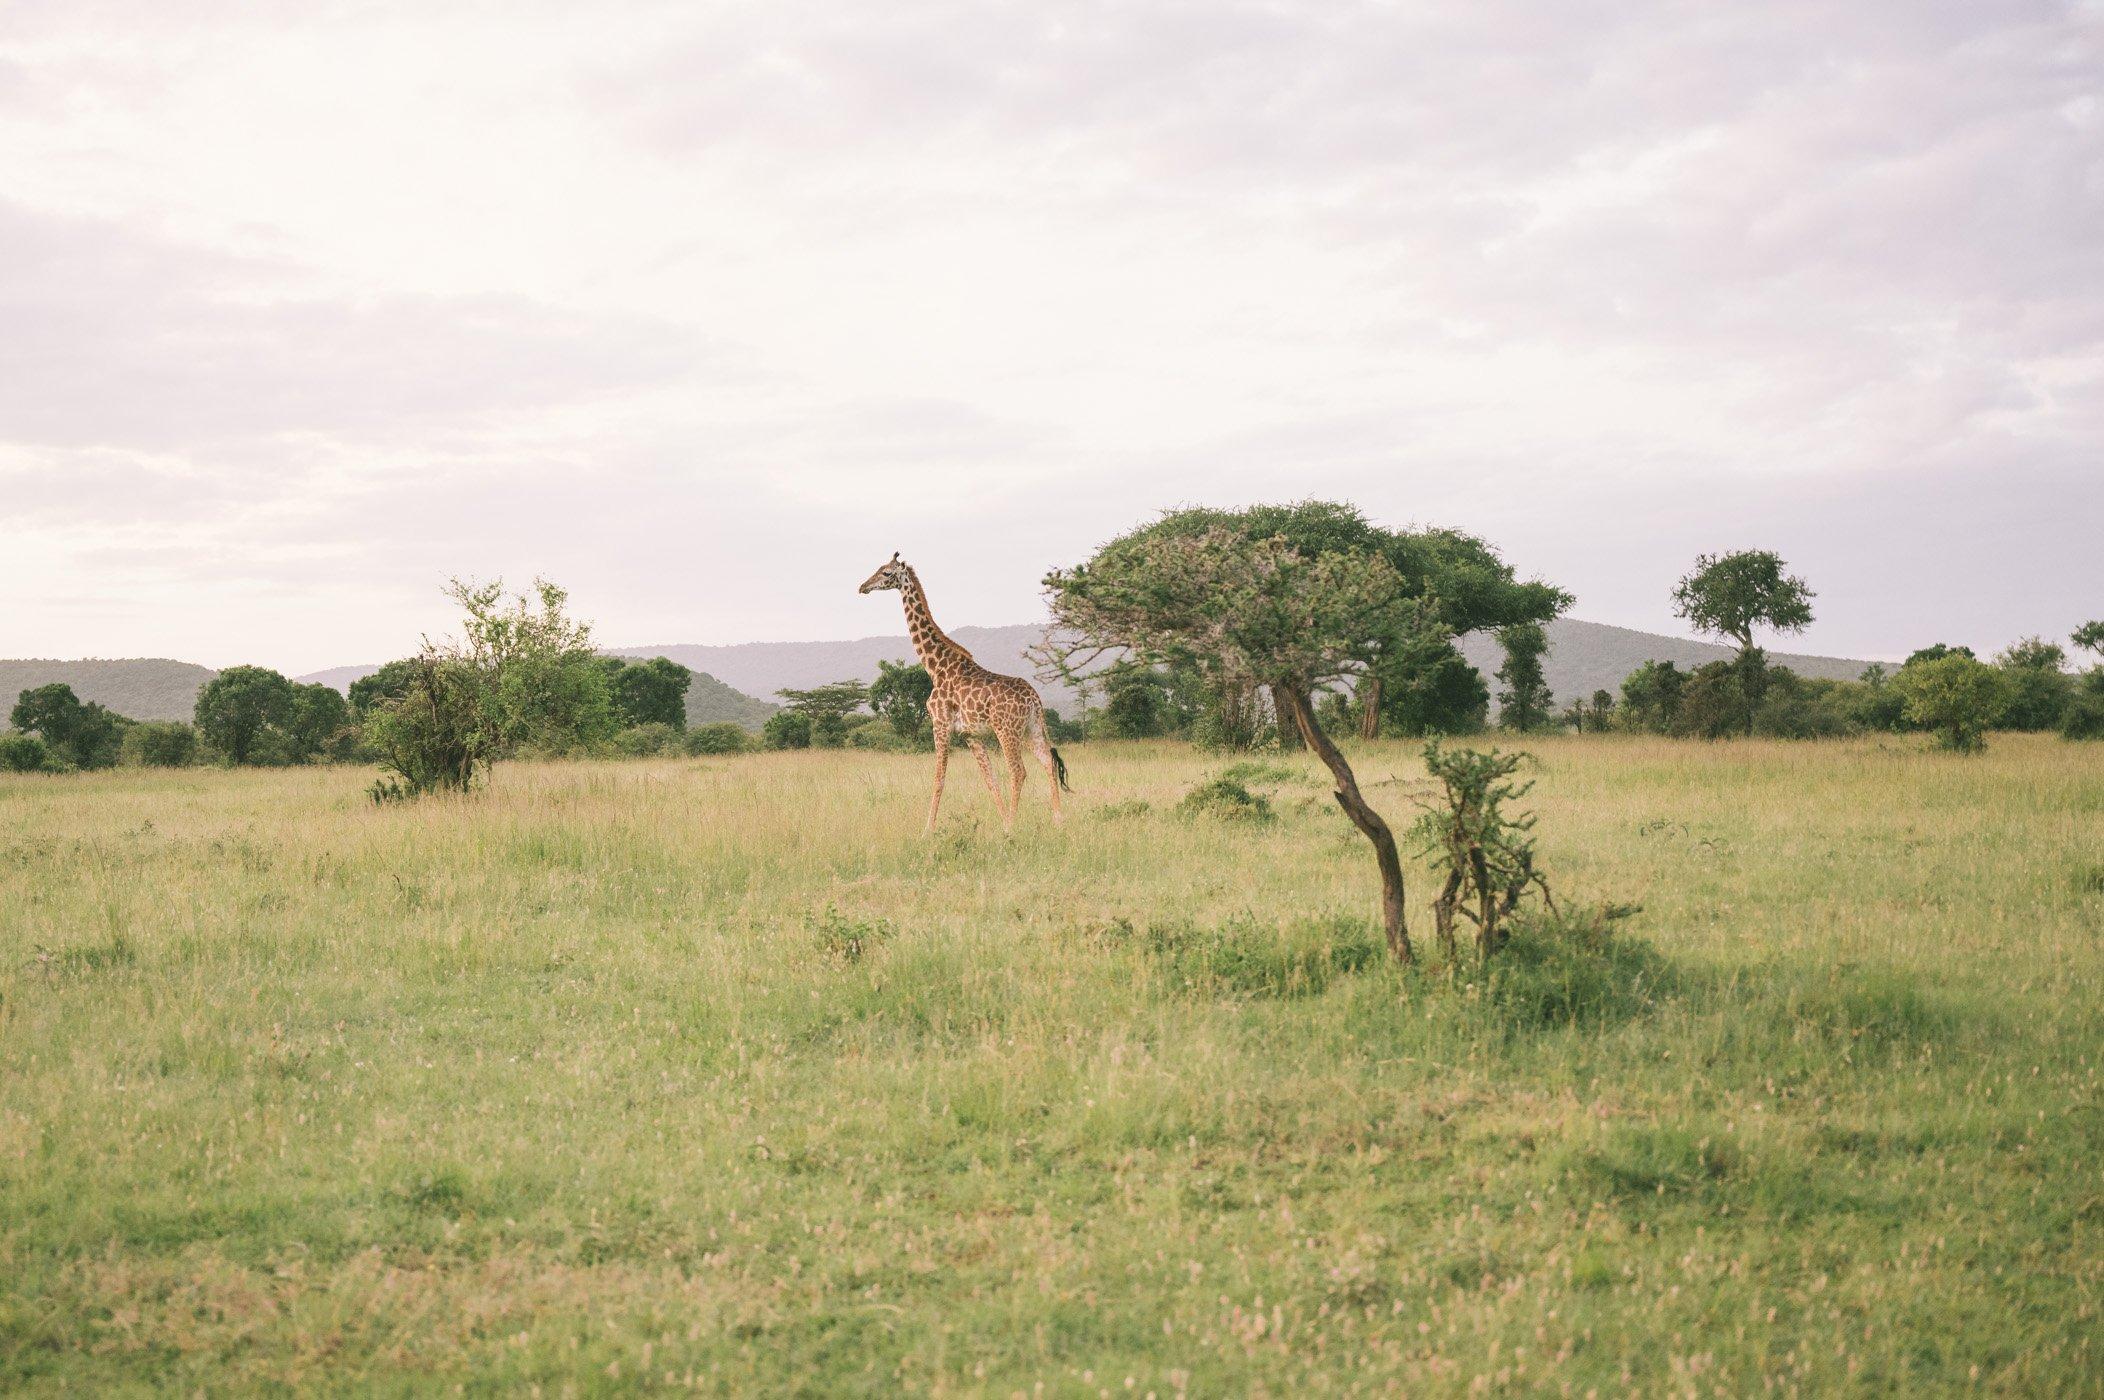 A giraffe in the Olderkesi Community Conservancy in Kenya